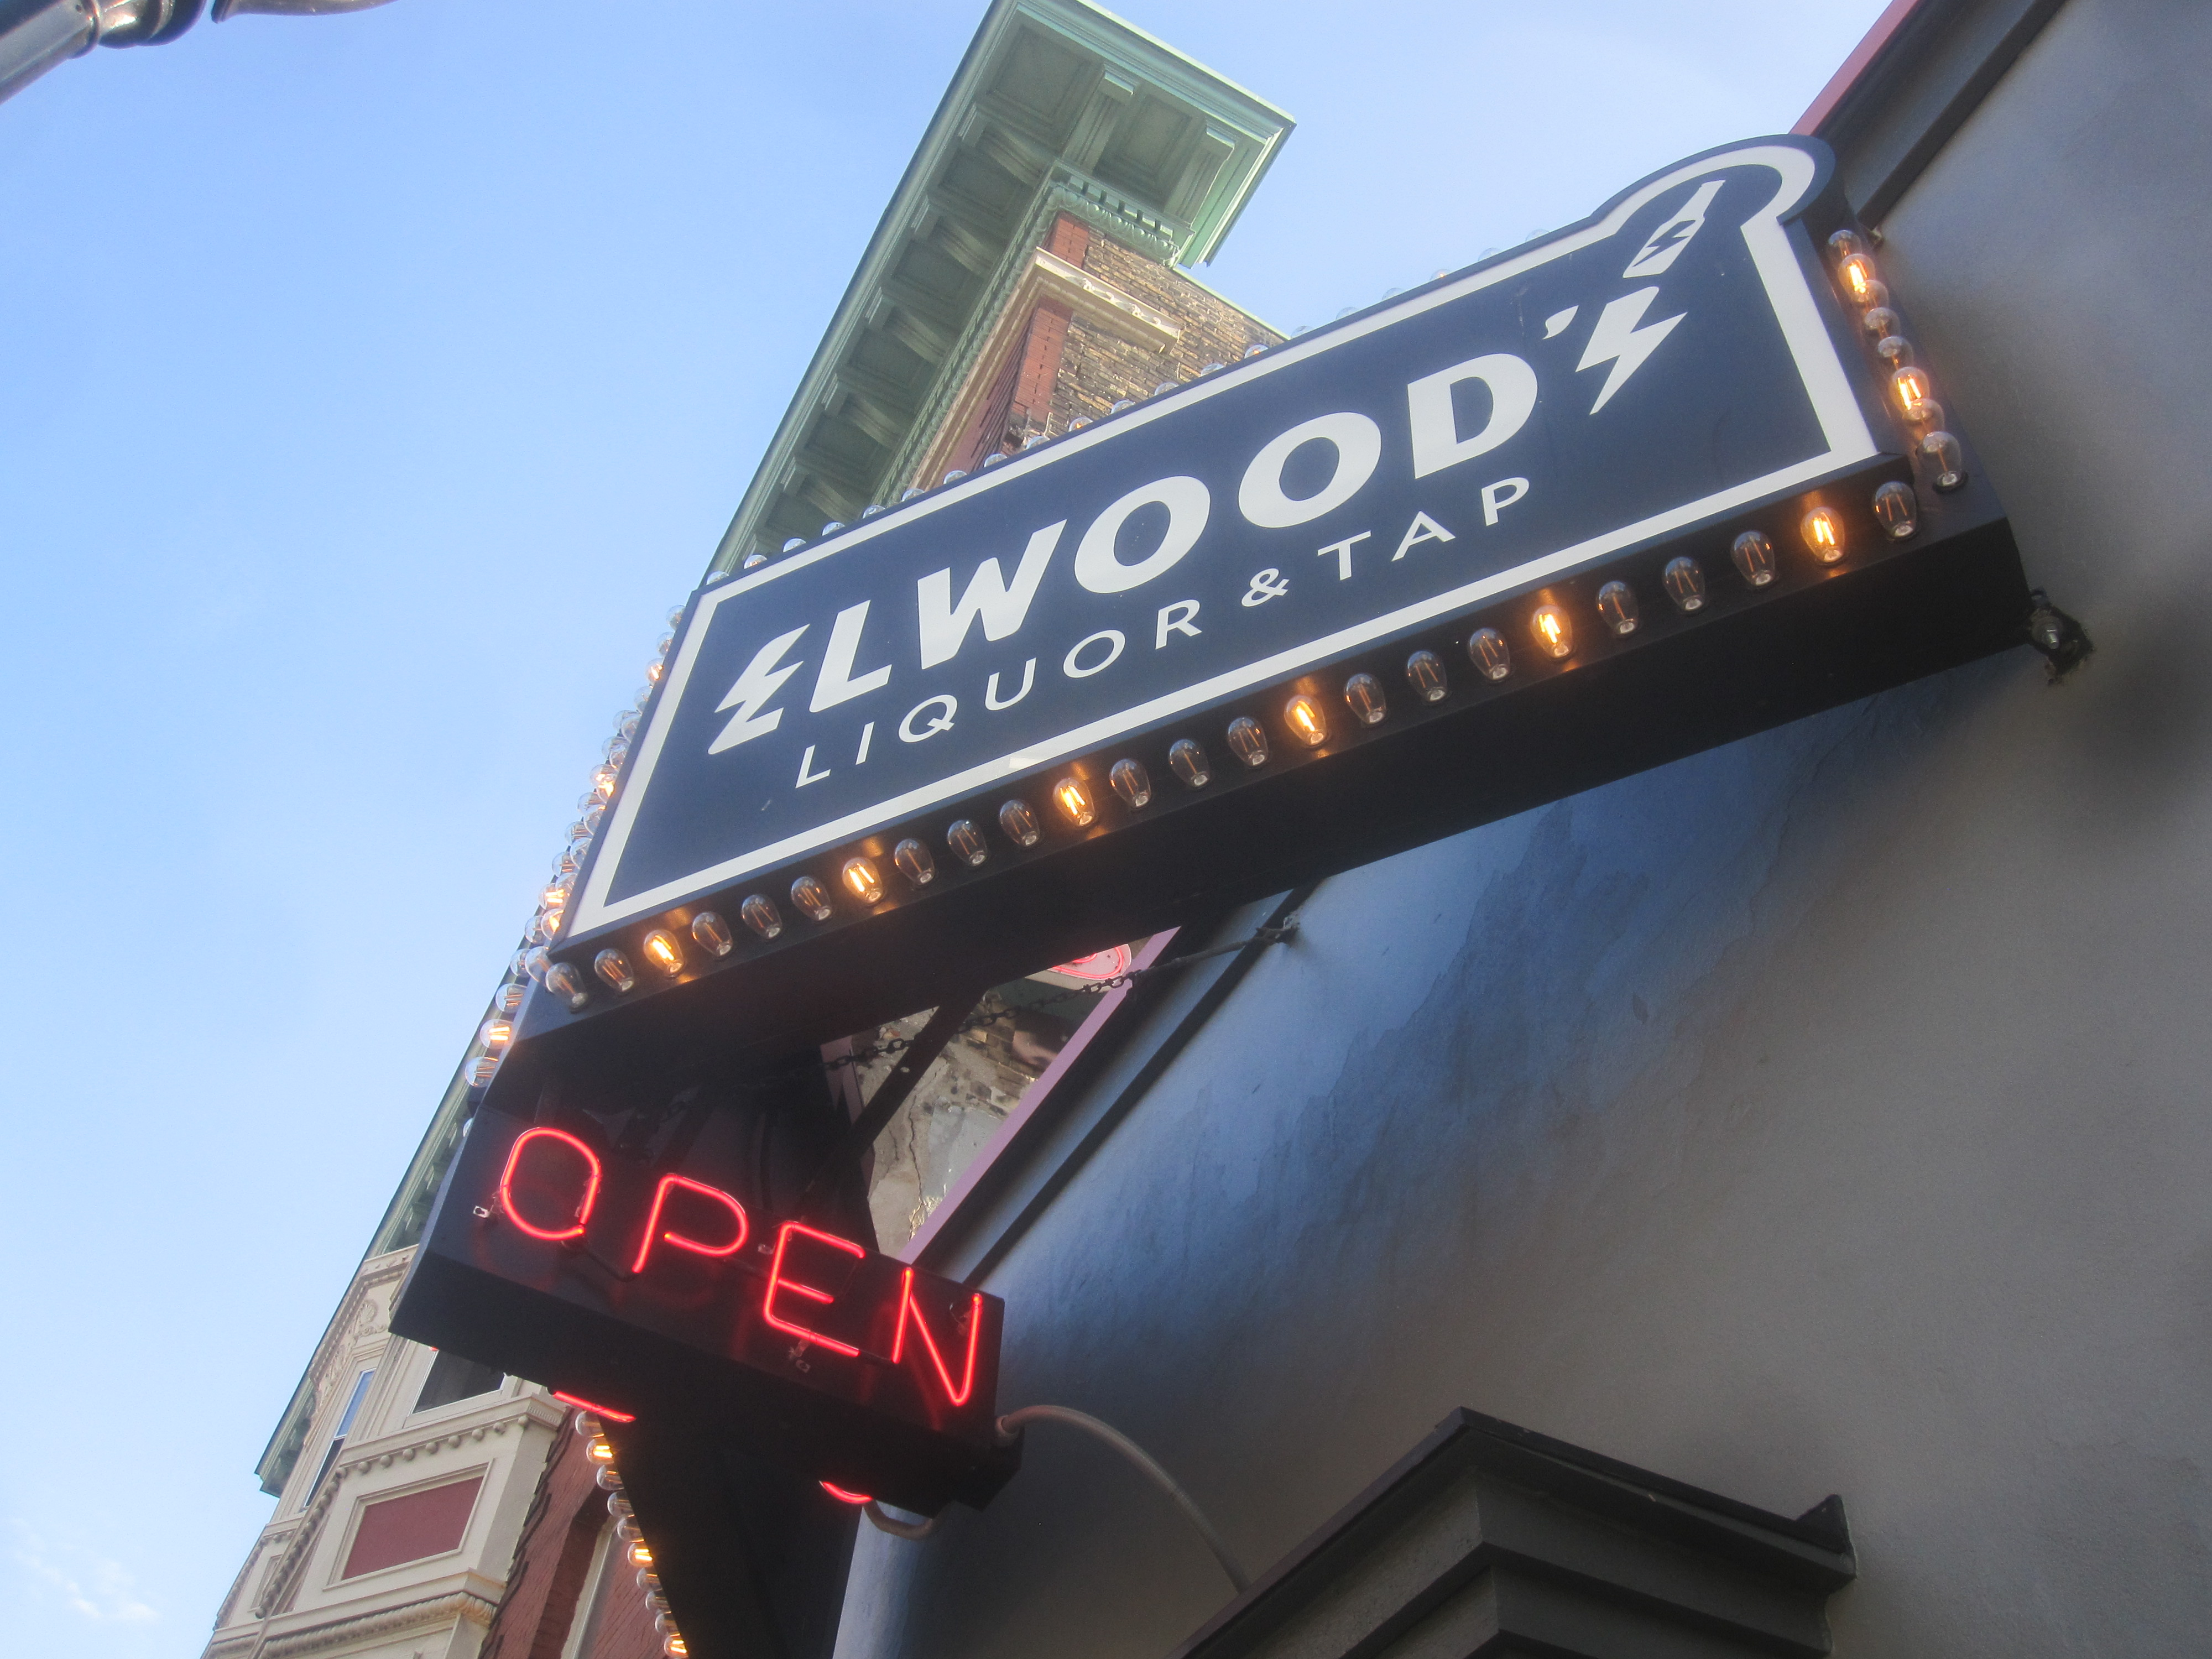 Elwood's Liquor & Tap. Photo by Michael Horne.